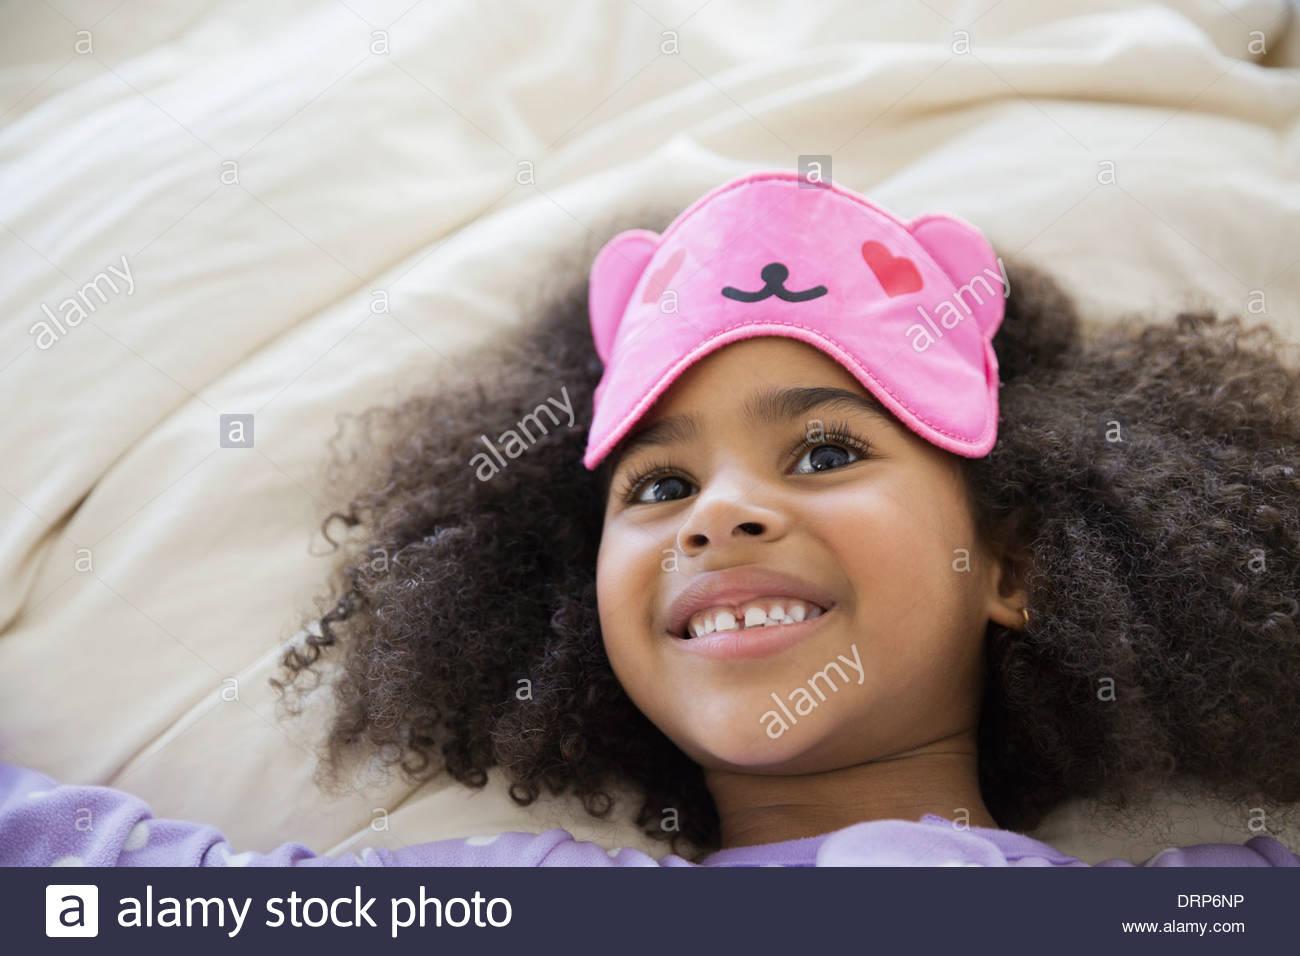 Cute girl wearing eye mask Photo Stock